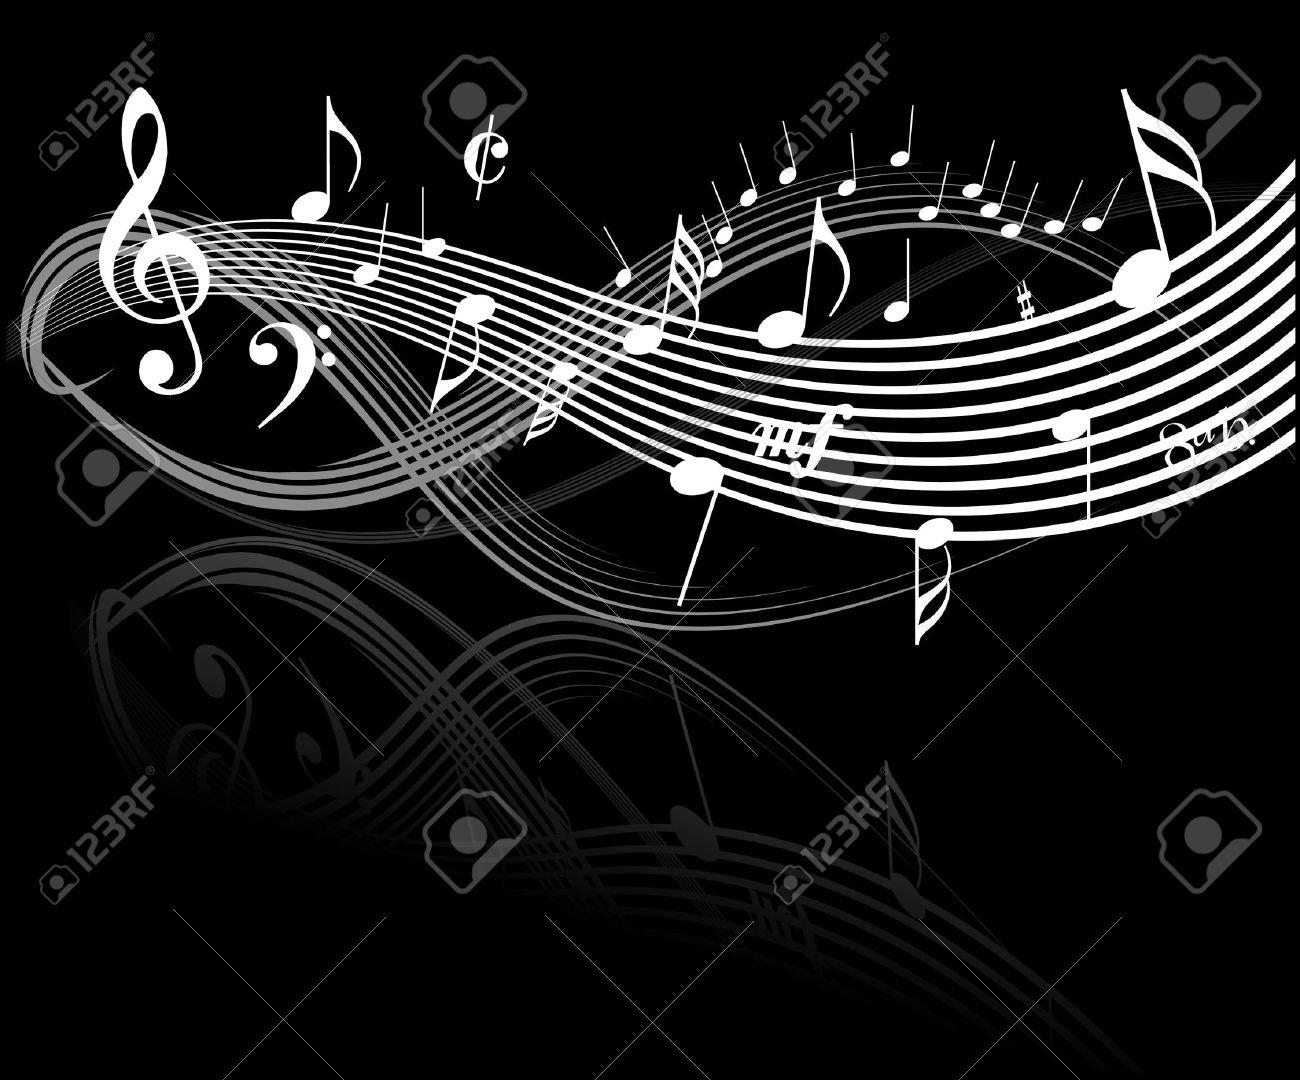 Music theme white notes on black background stock photo 3076063